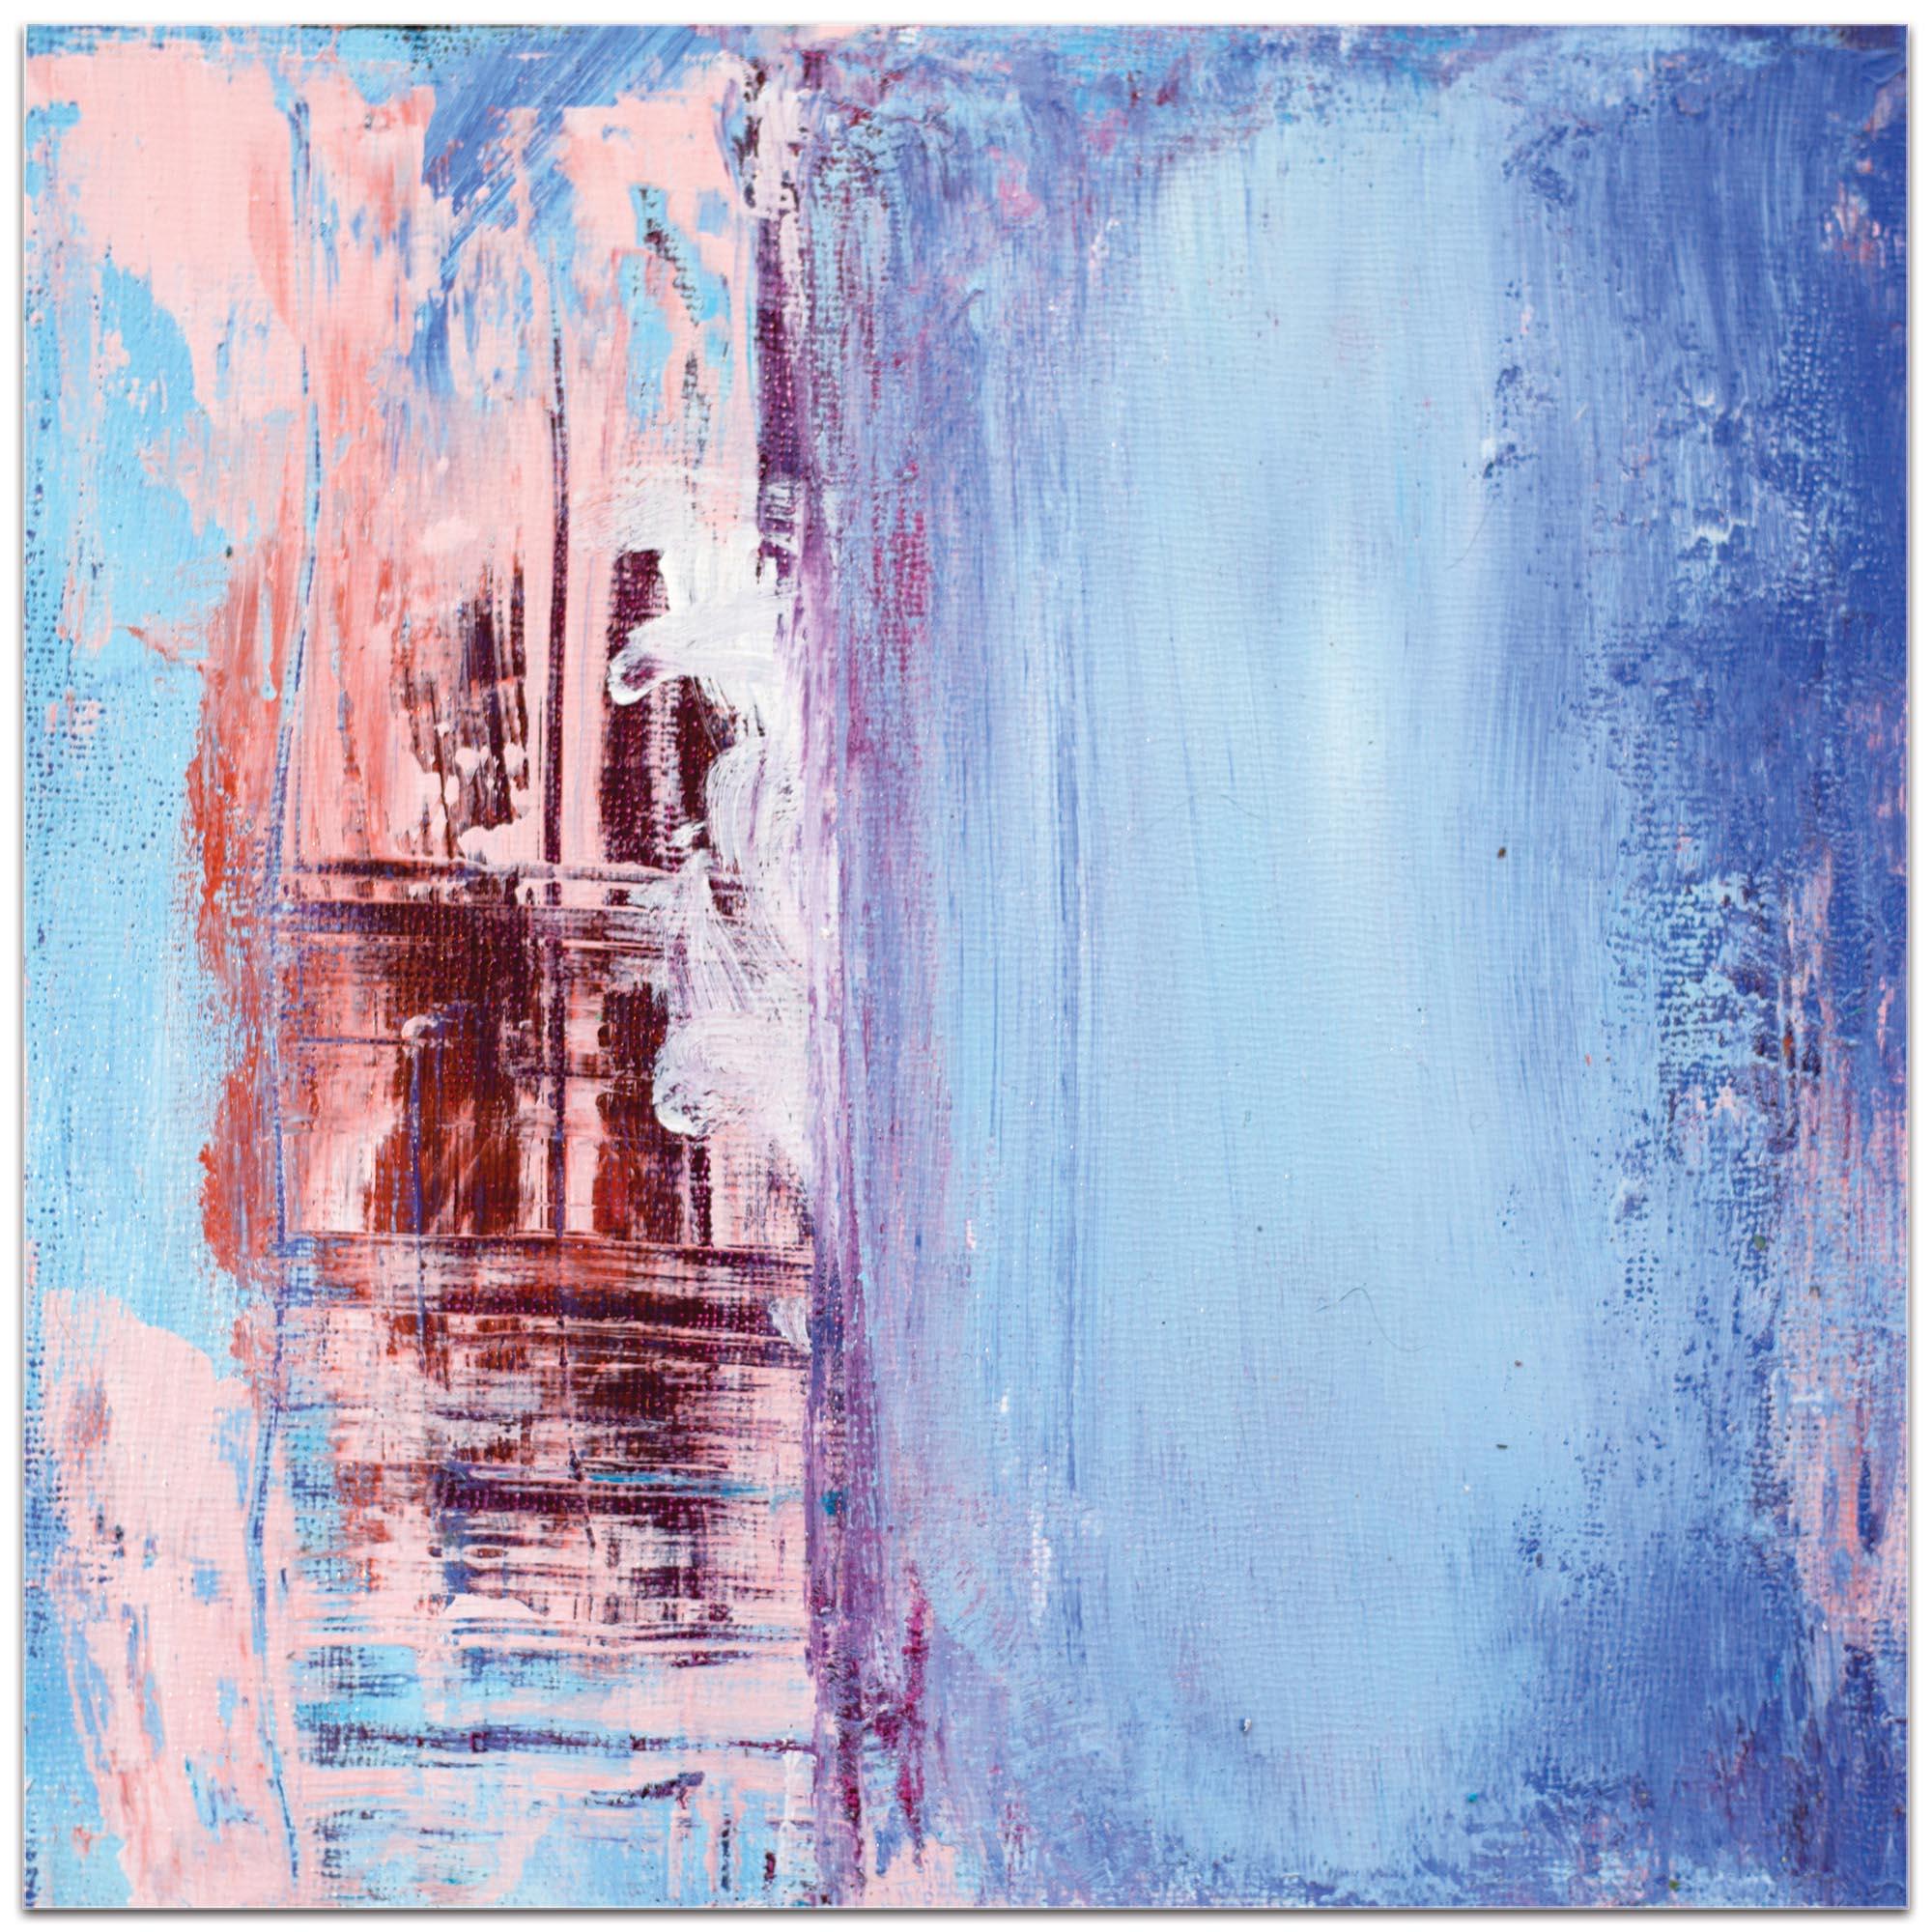 Abstract Wall Art 'Urban Life 2' - Urban Decor on Metal or Plexiglass - Image 2